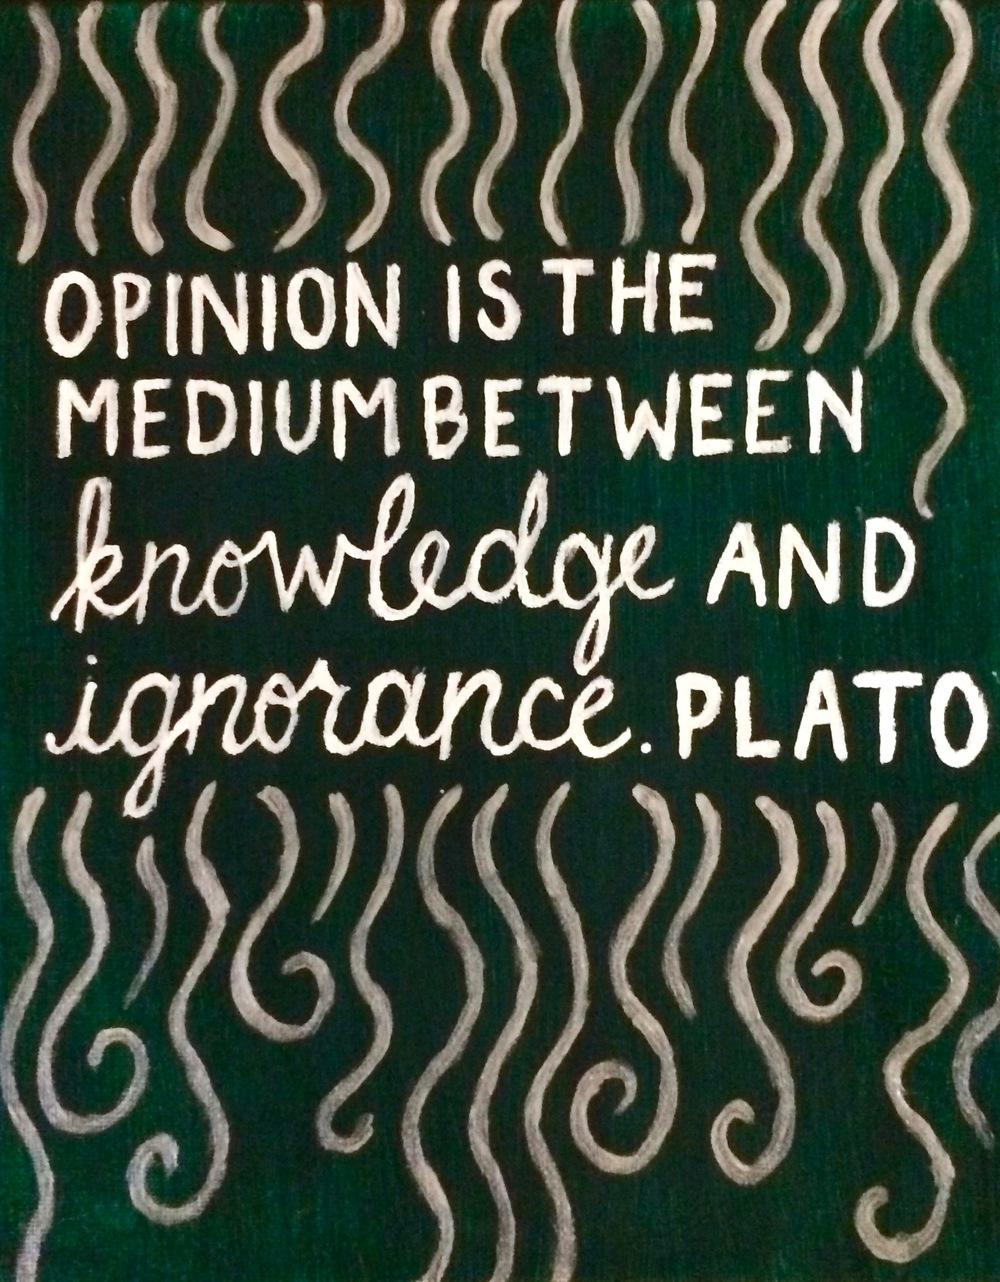 Quote Plato.jpg